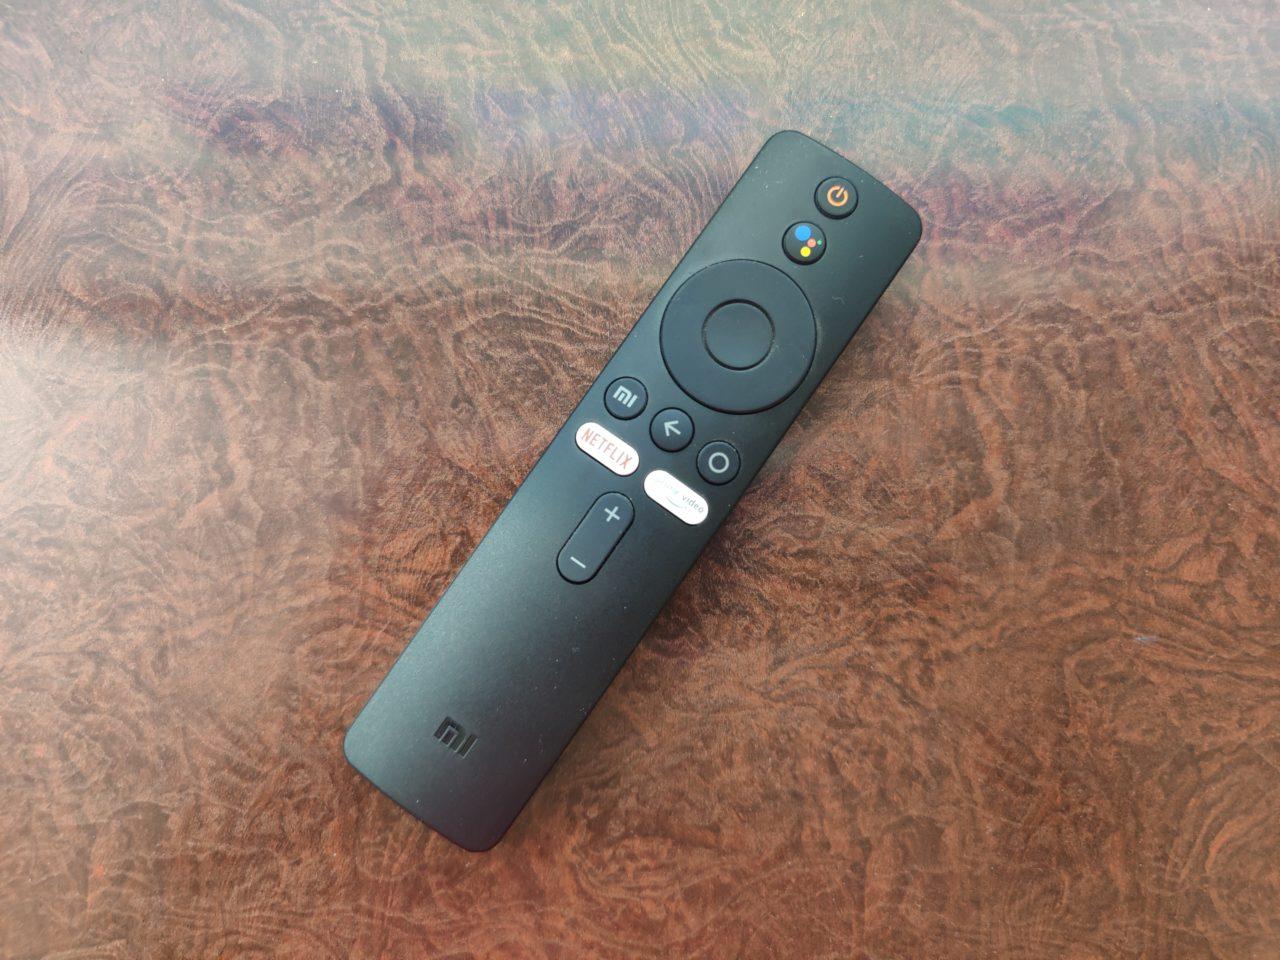 Mi TV 4A Horizon Edition review